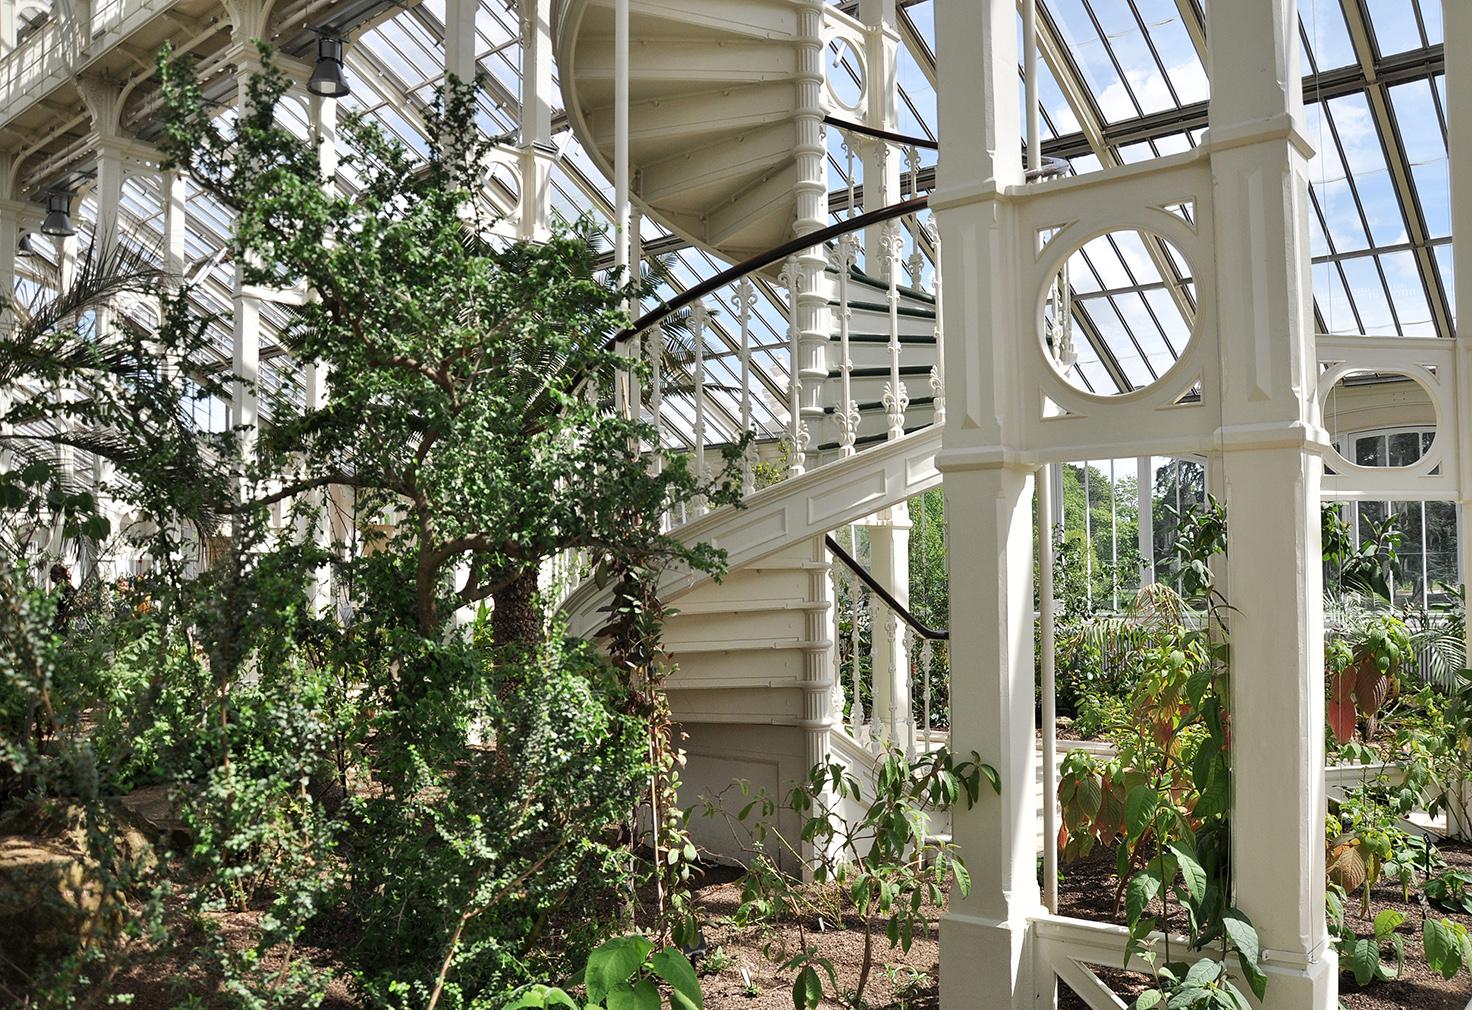 Explore Kew Gardens' freshly restored Temperate House